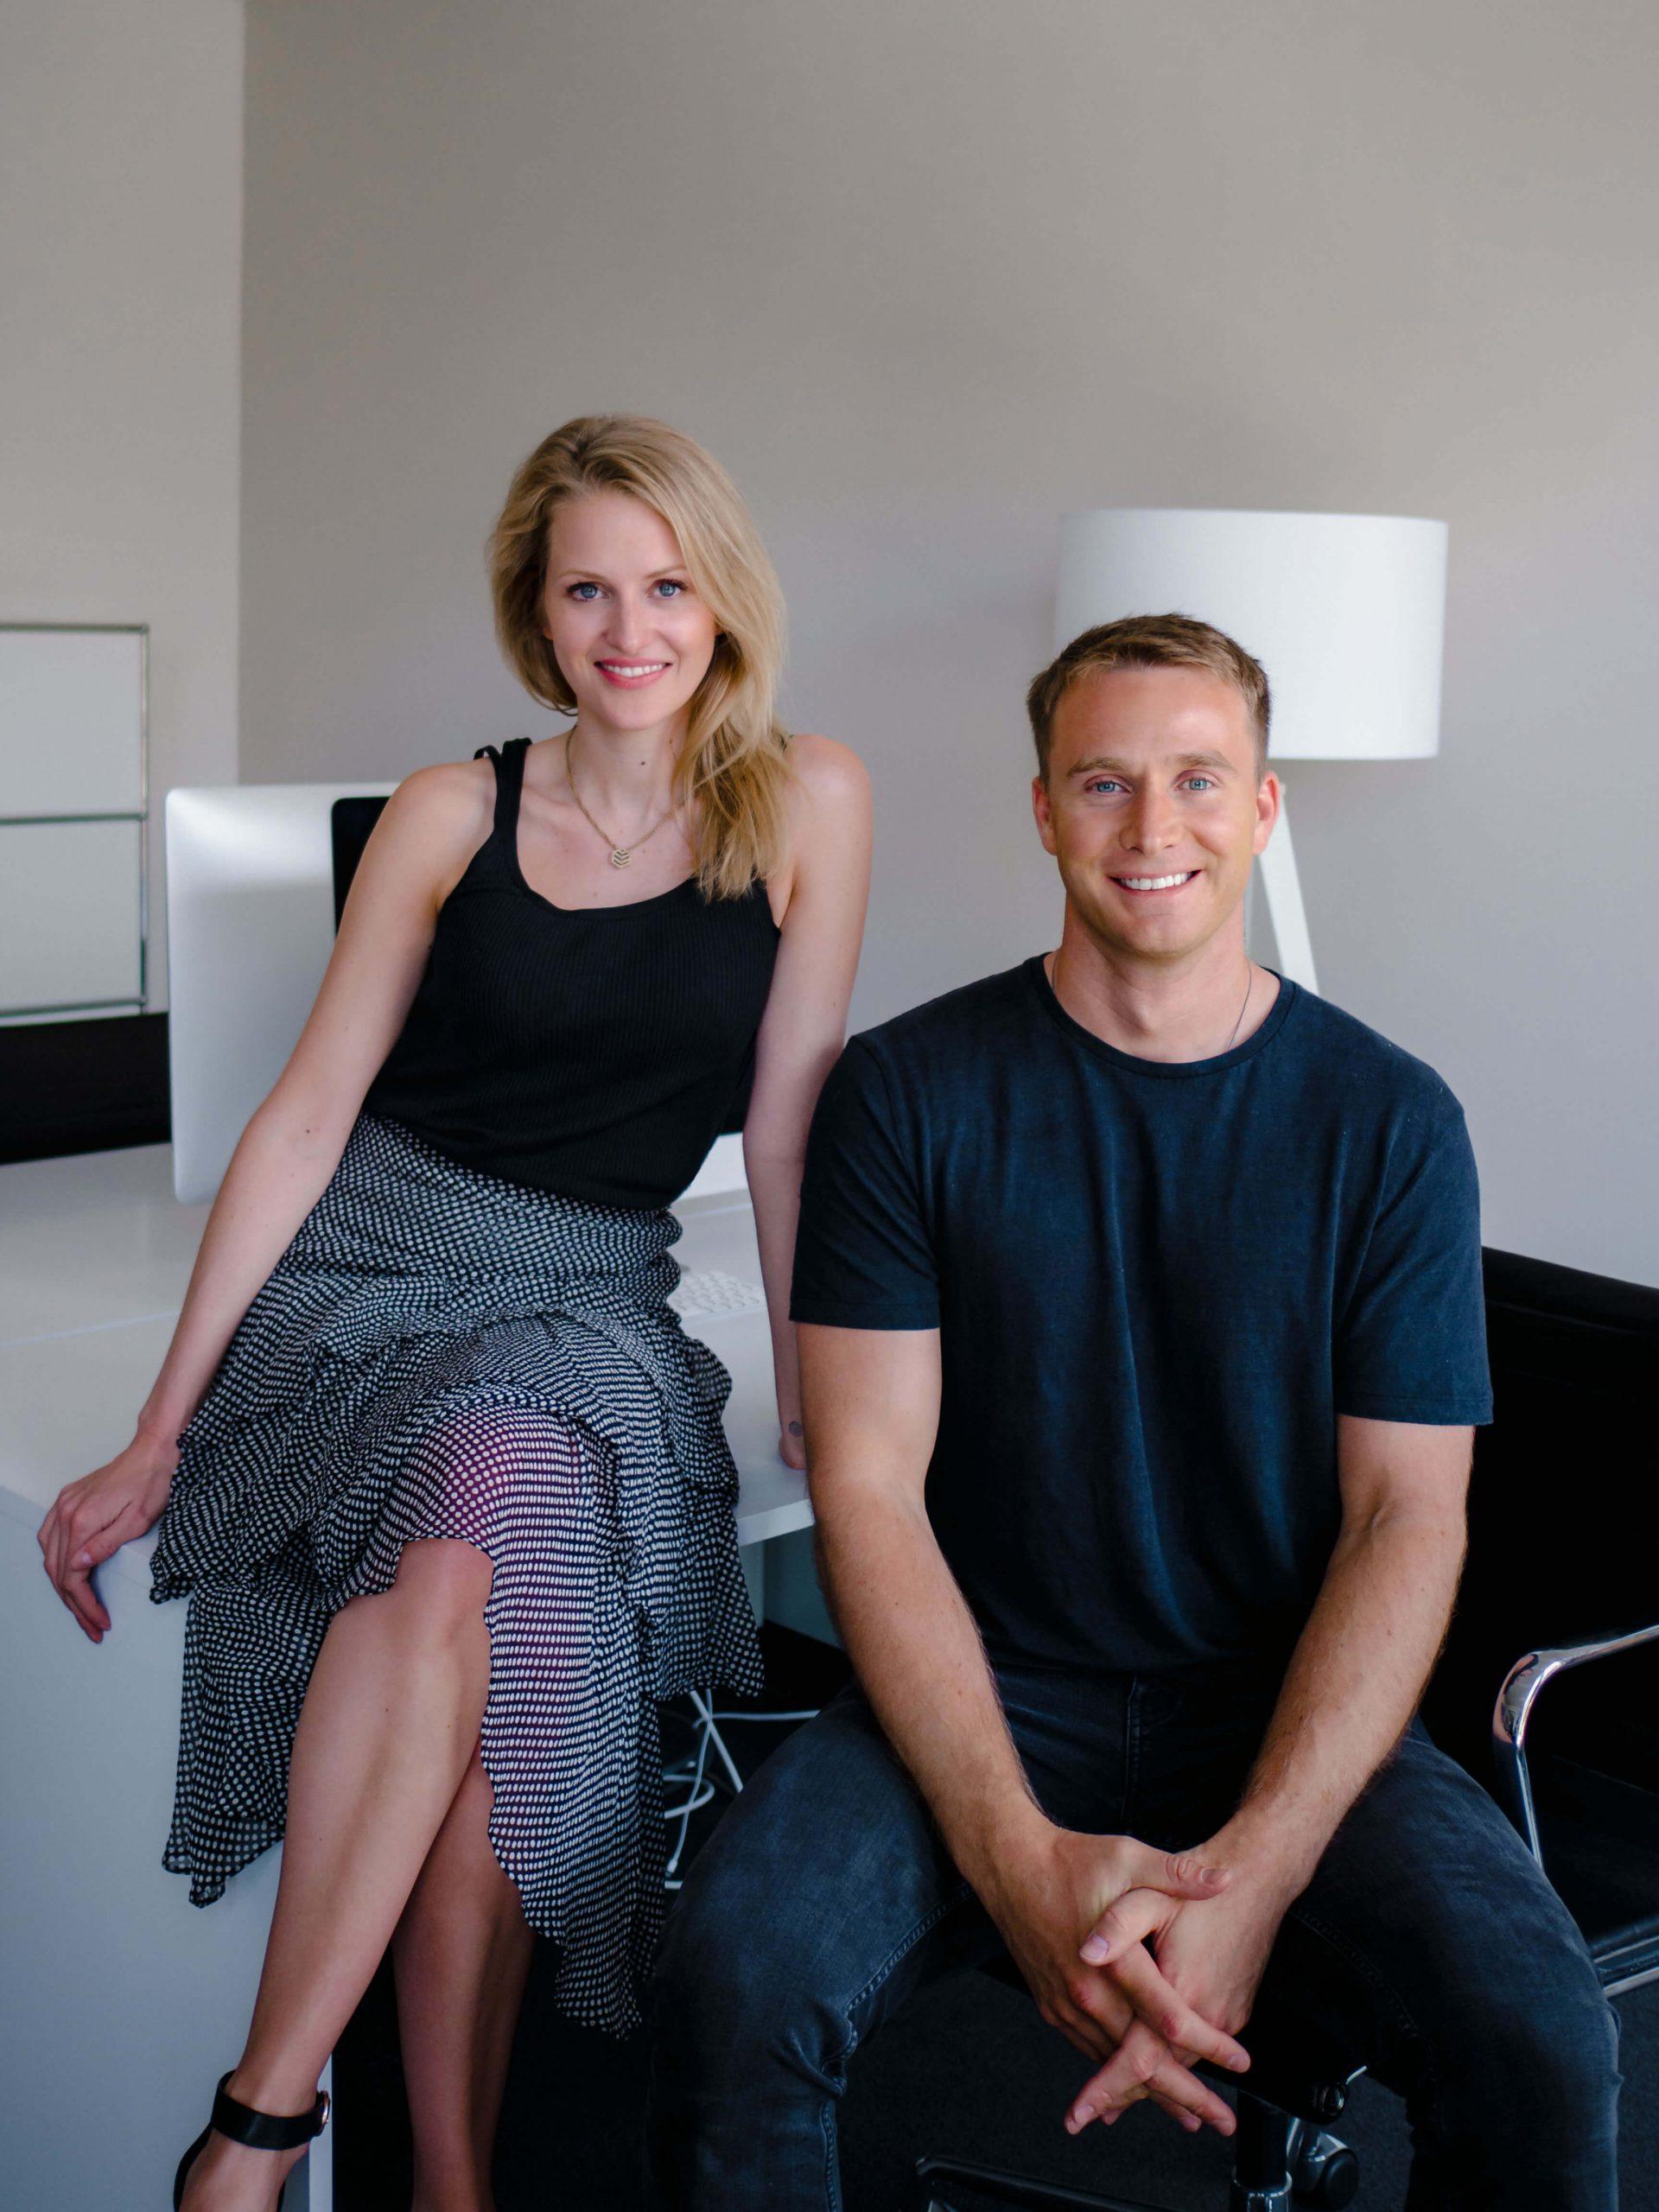 Lara Daniel & Christoph Kastenholz | CEO & Co-Founder of Pulse Advertising